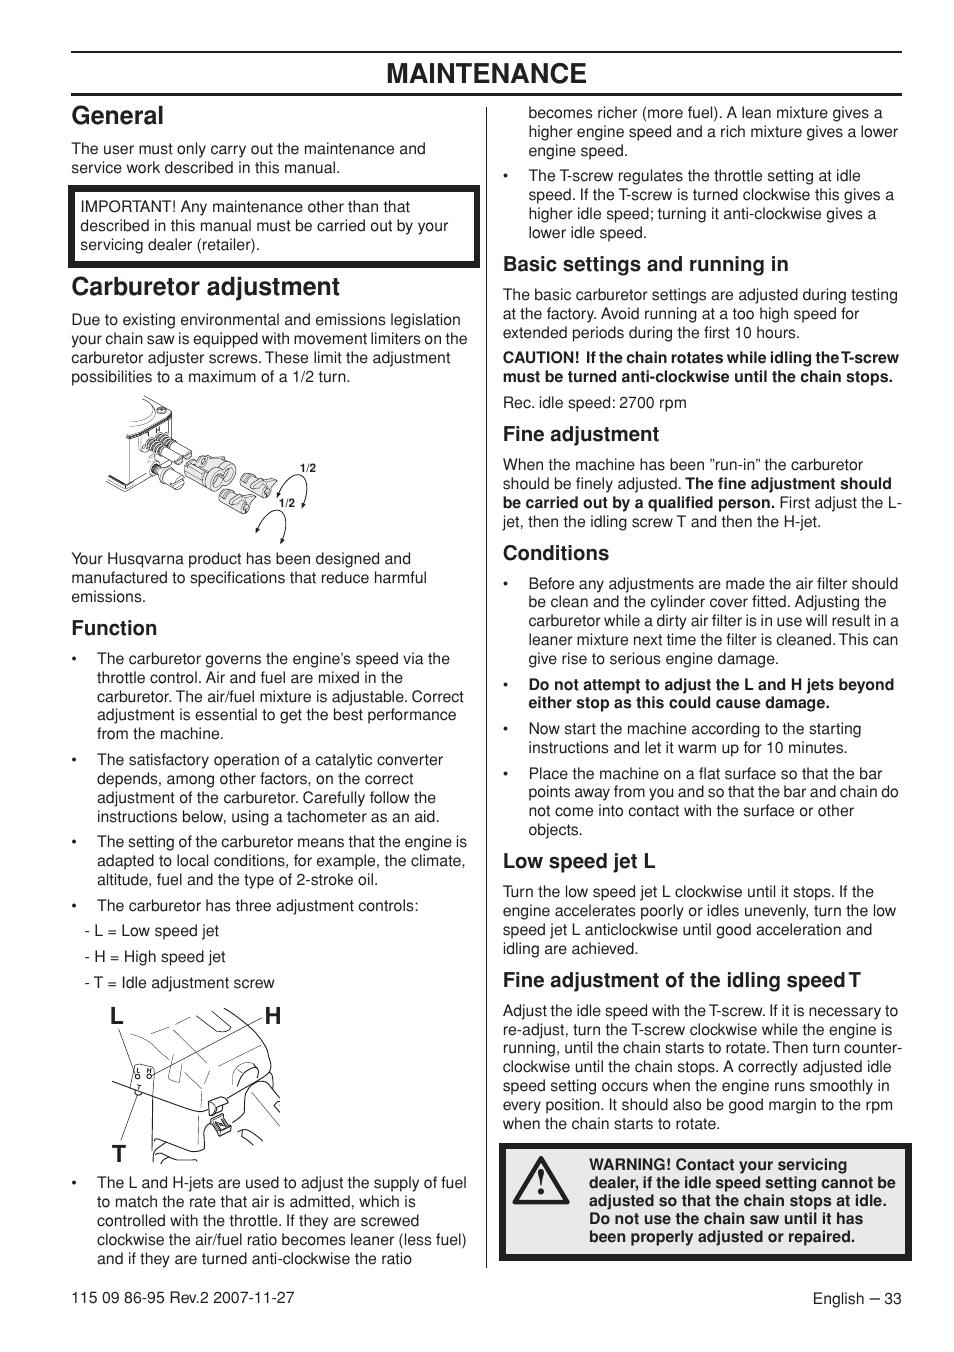 General, Carburetor adjustment, Function | Husqvarna 350 epa I User Manual  | Page 33 / 48